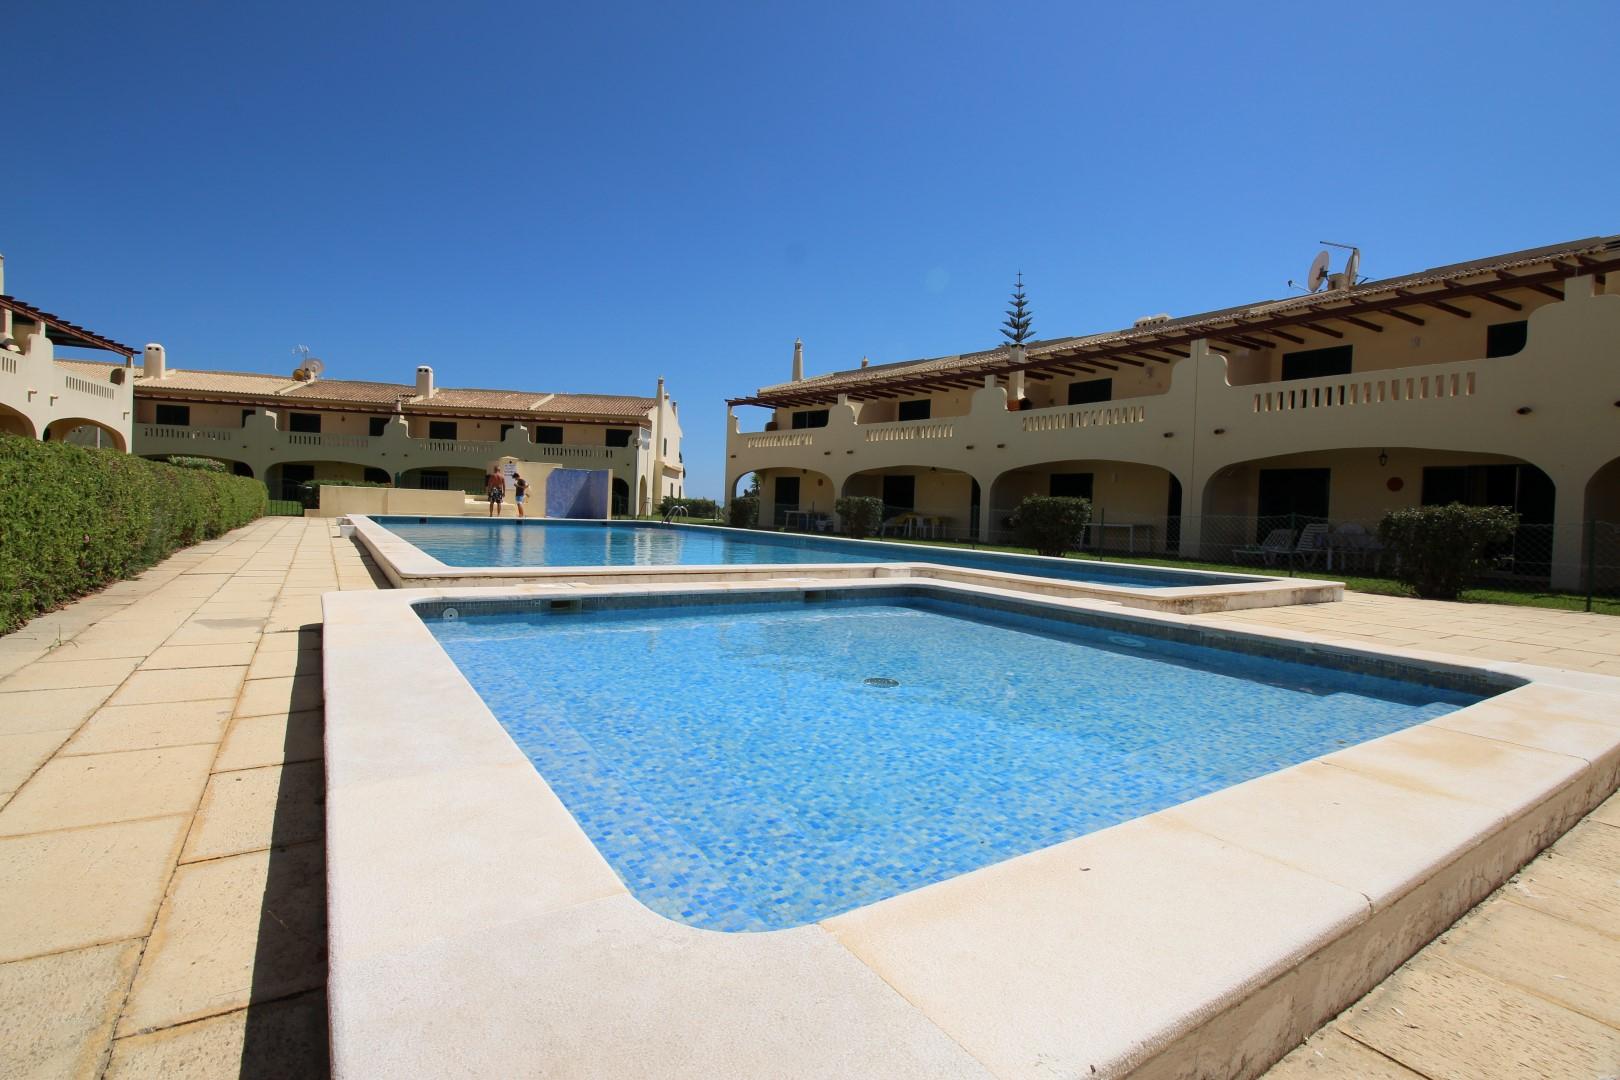 Rent Apartment 6 Guests In Porches, Algarve Portugal ... concernant Terrasse Avec Piscine